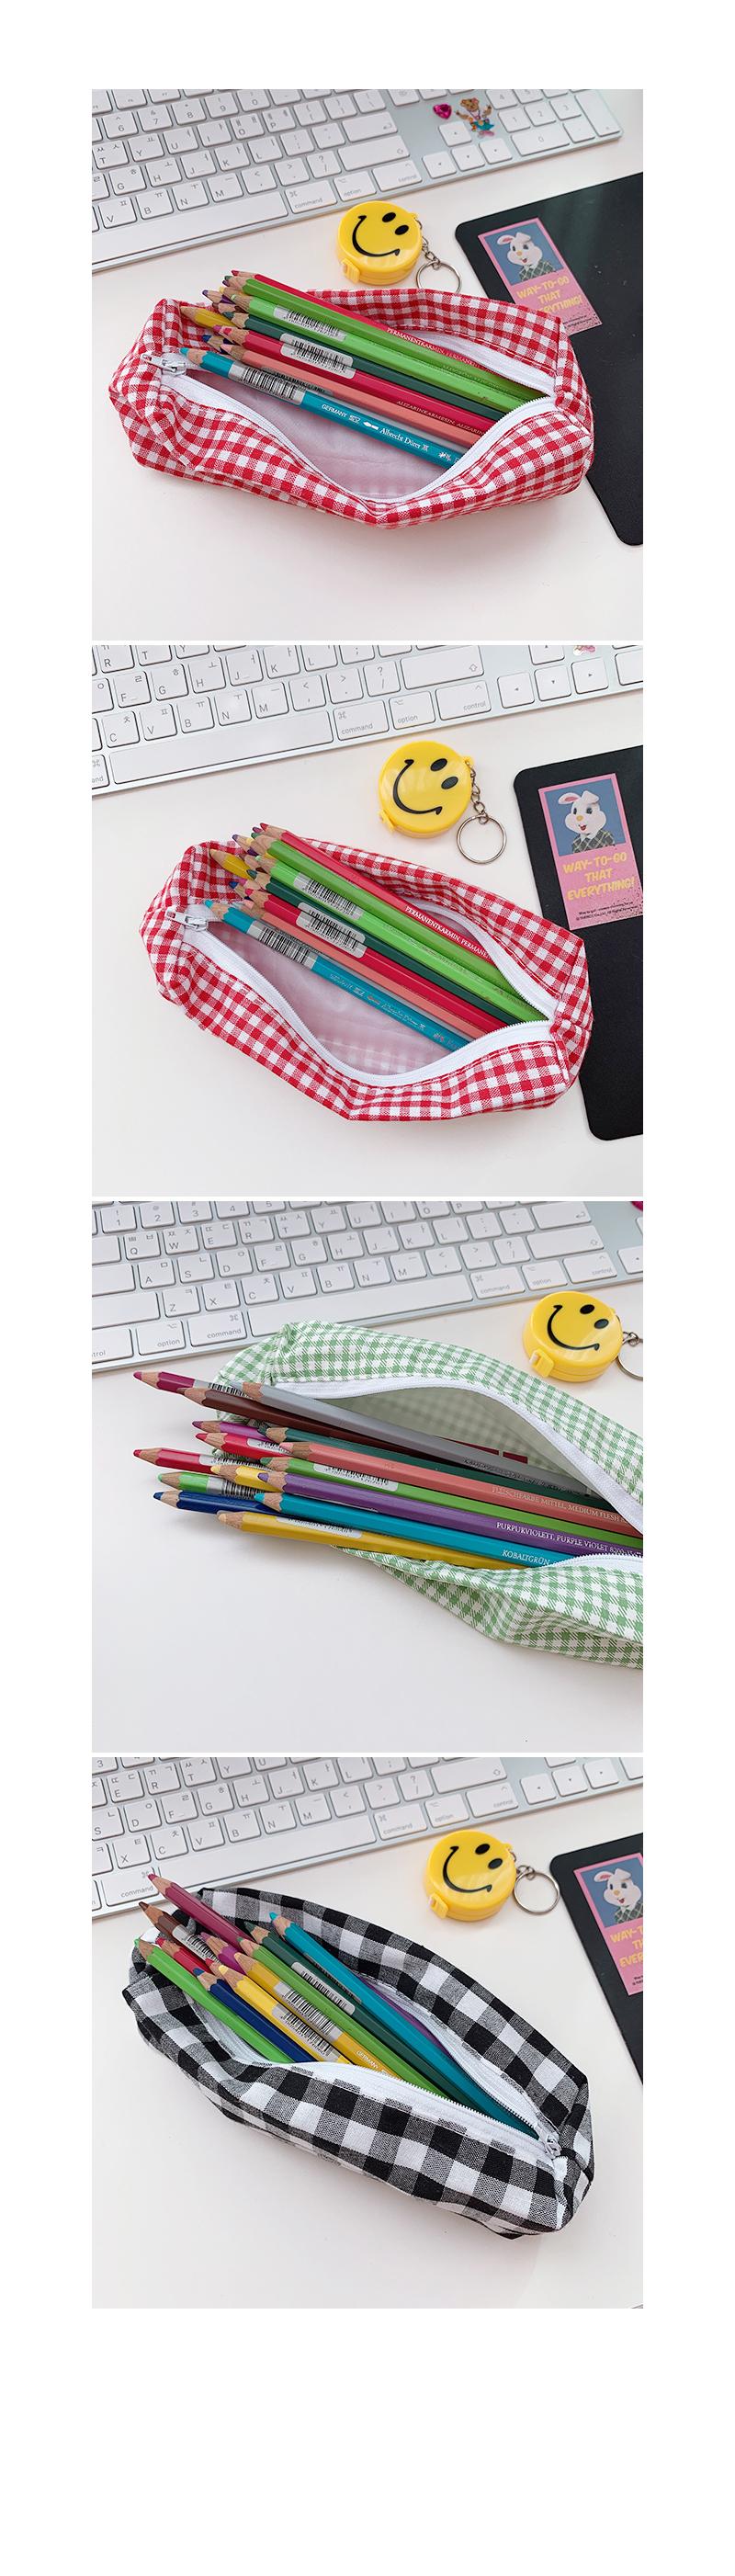 Amy Check Pencil Case 에이미체크필통 - 메종드알로하, 4,000원, 패브릭필통, 심플